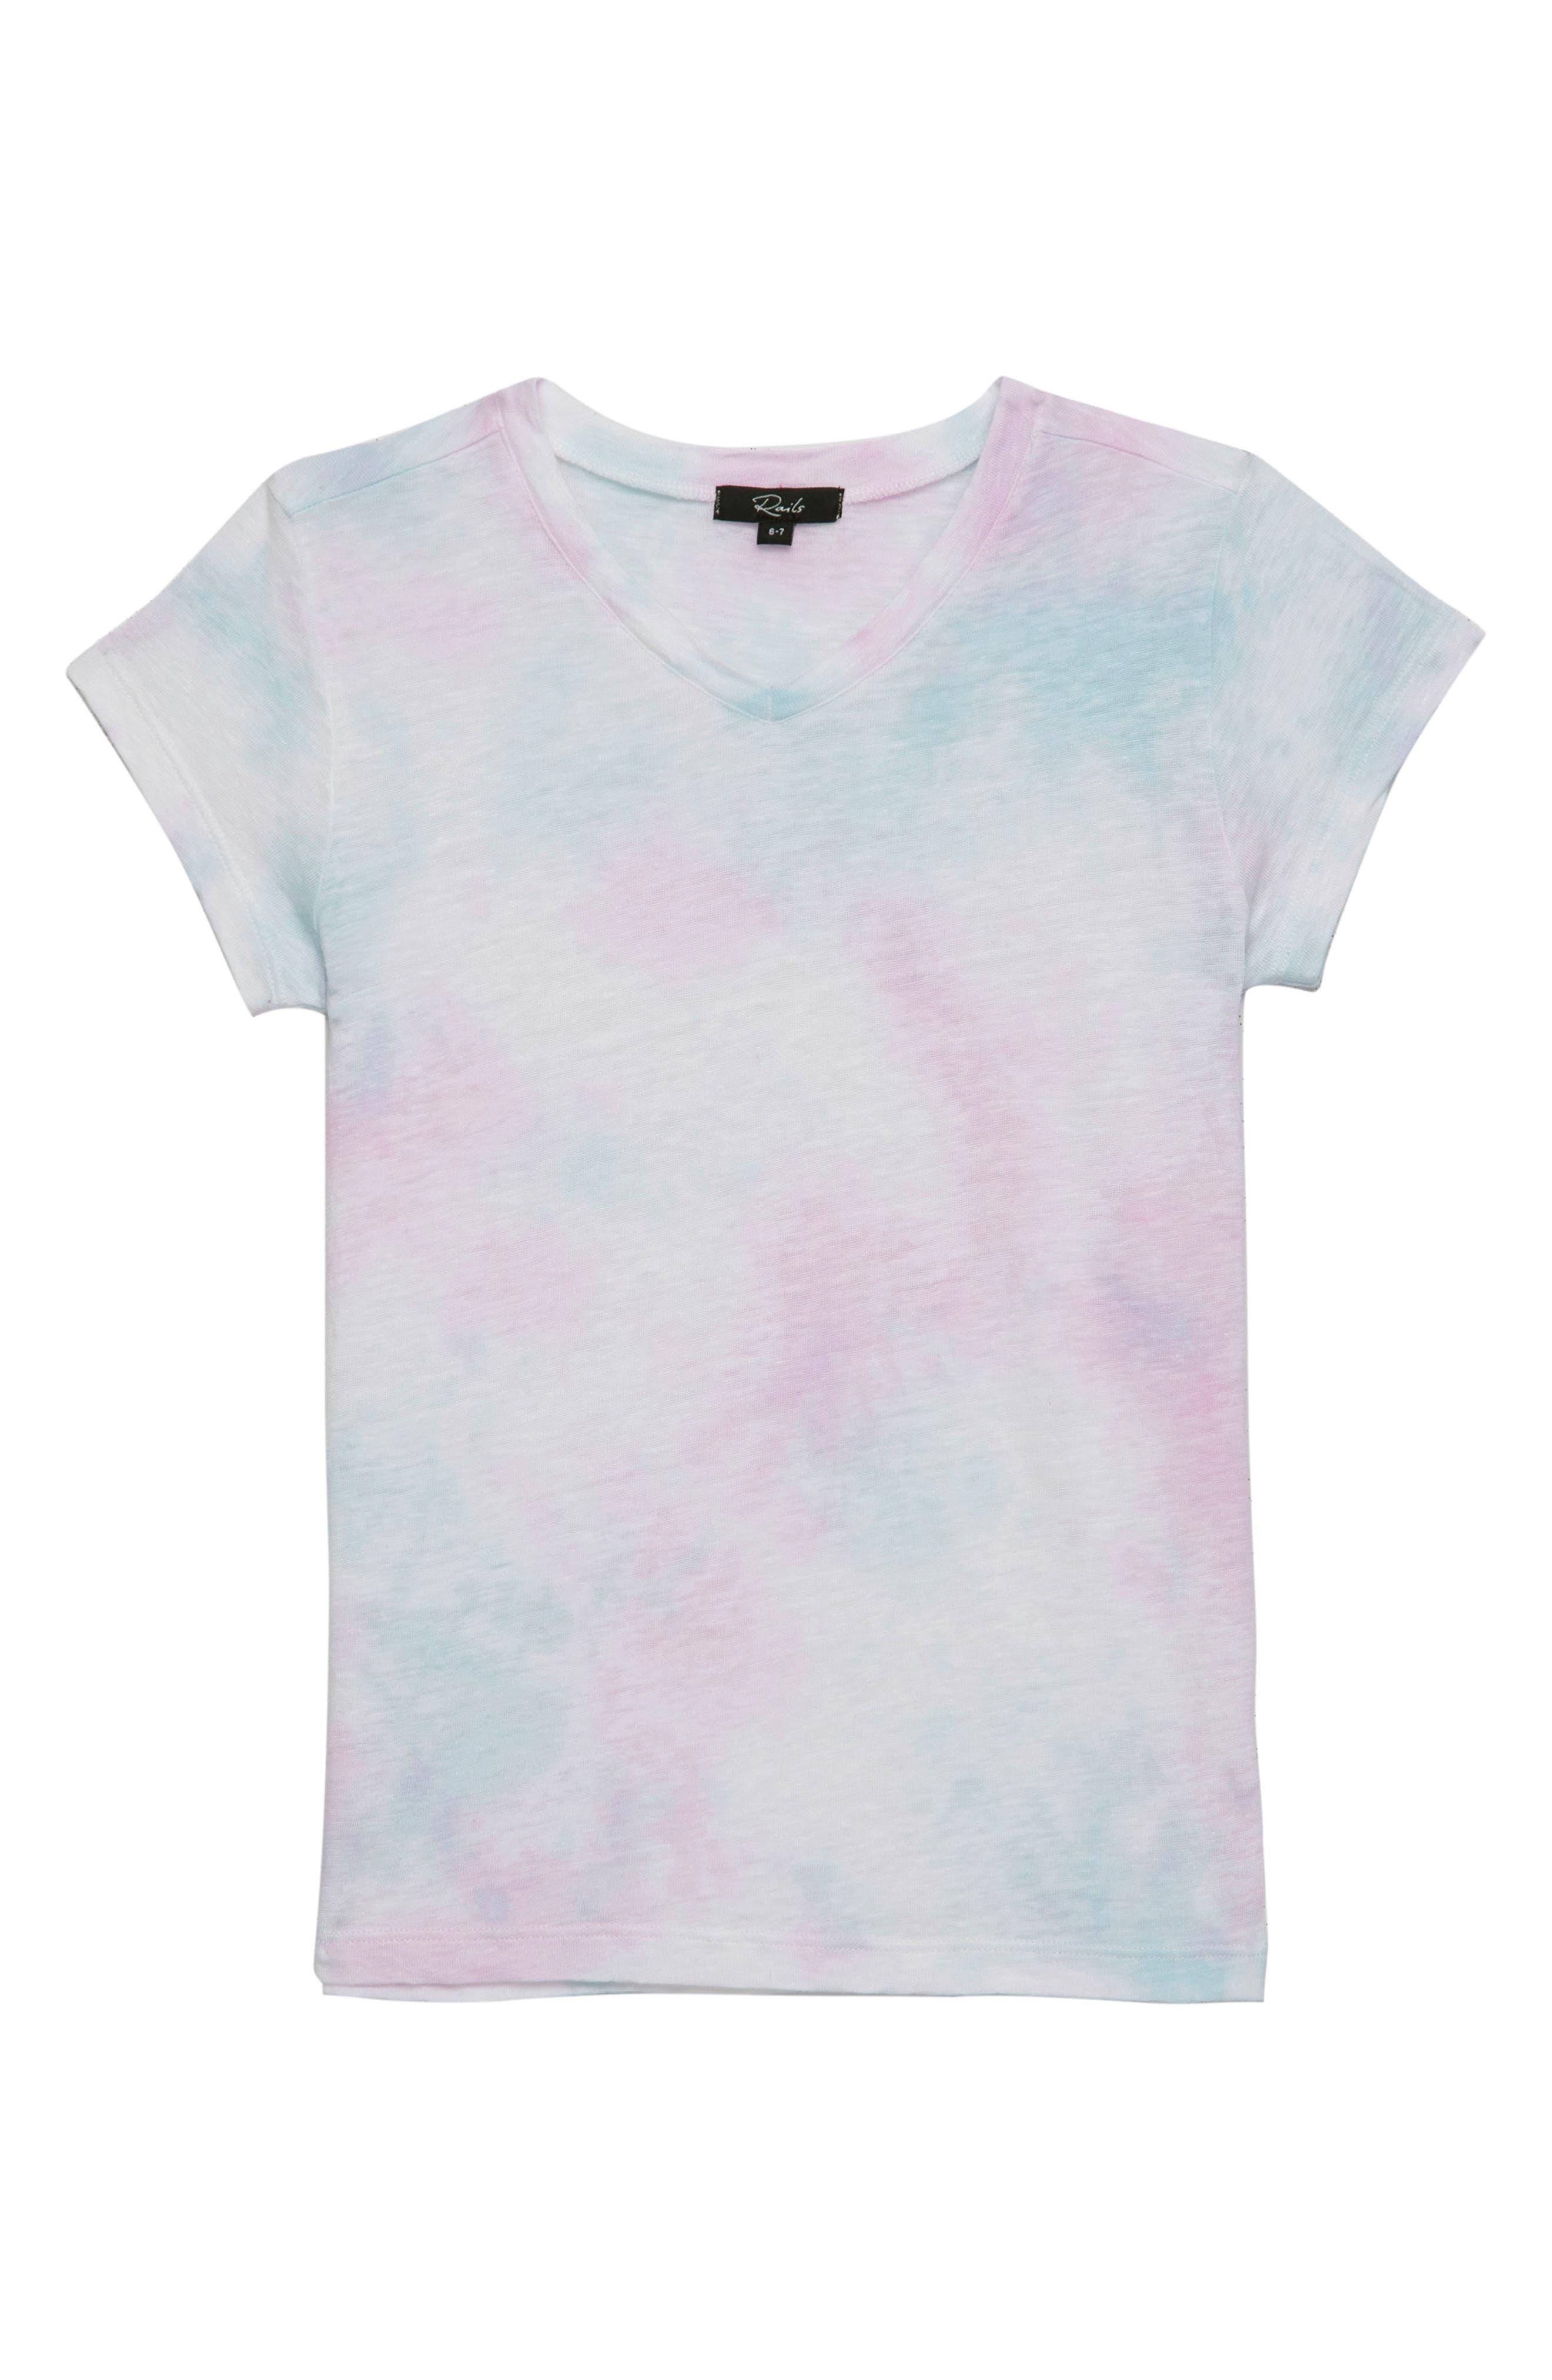 Carlyn Tee,                         Main,                         color, Rainbow Tie Dye